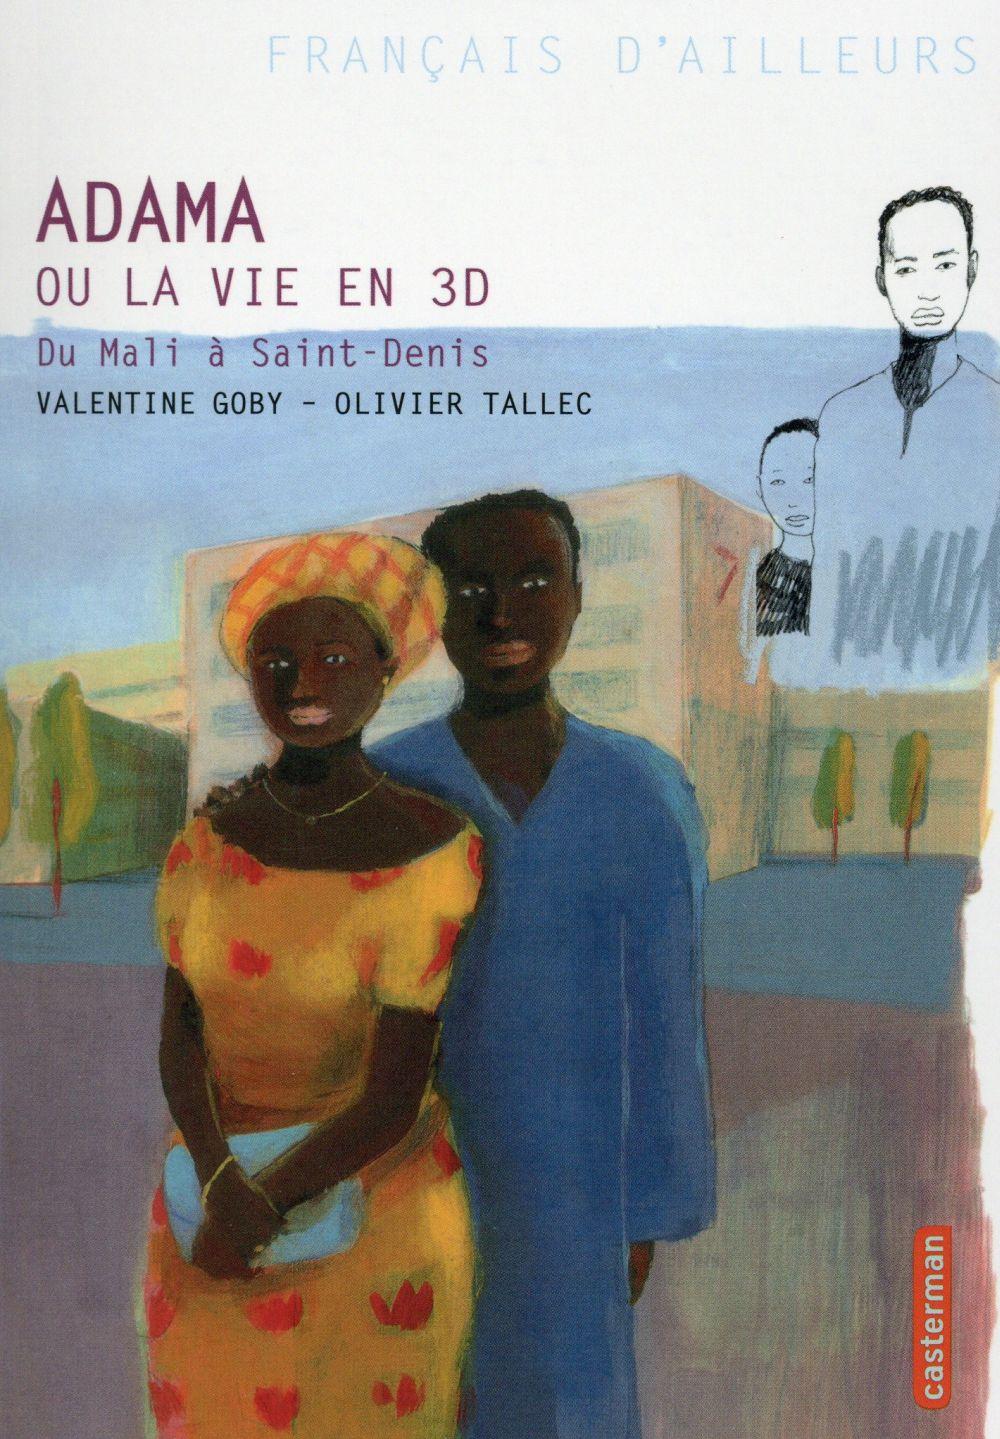 Adama ou La vie en 3D